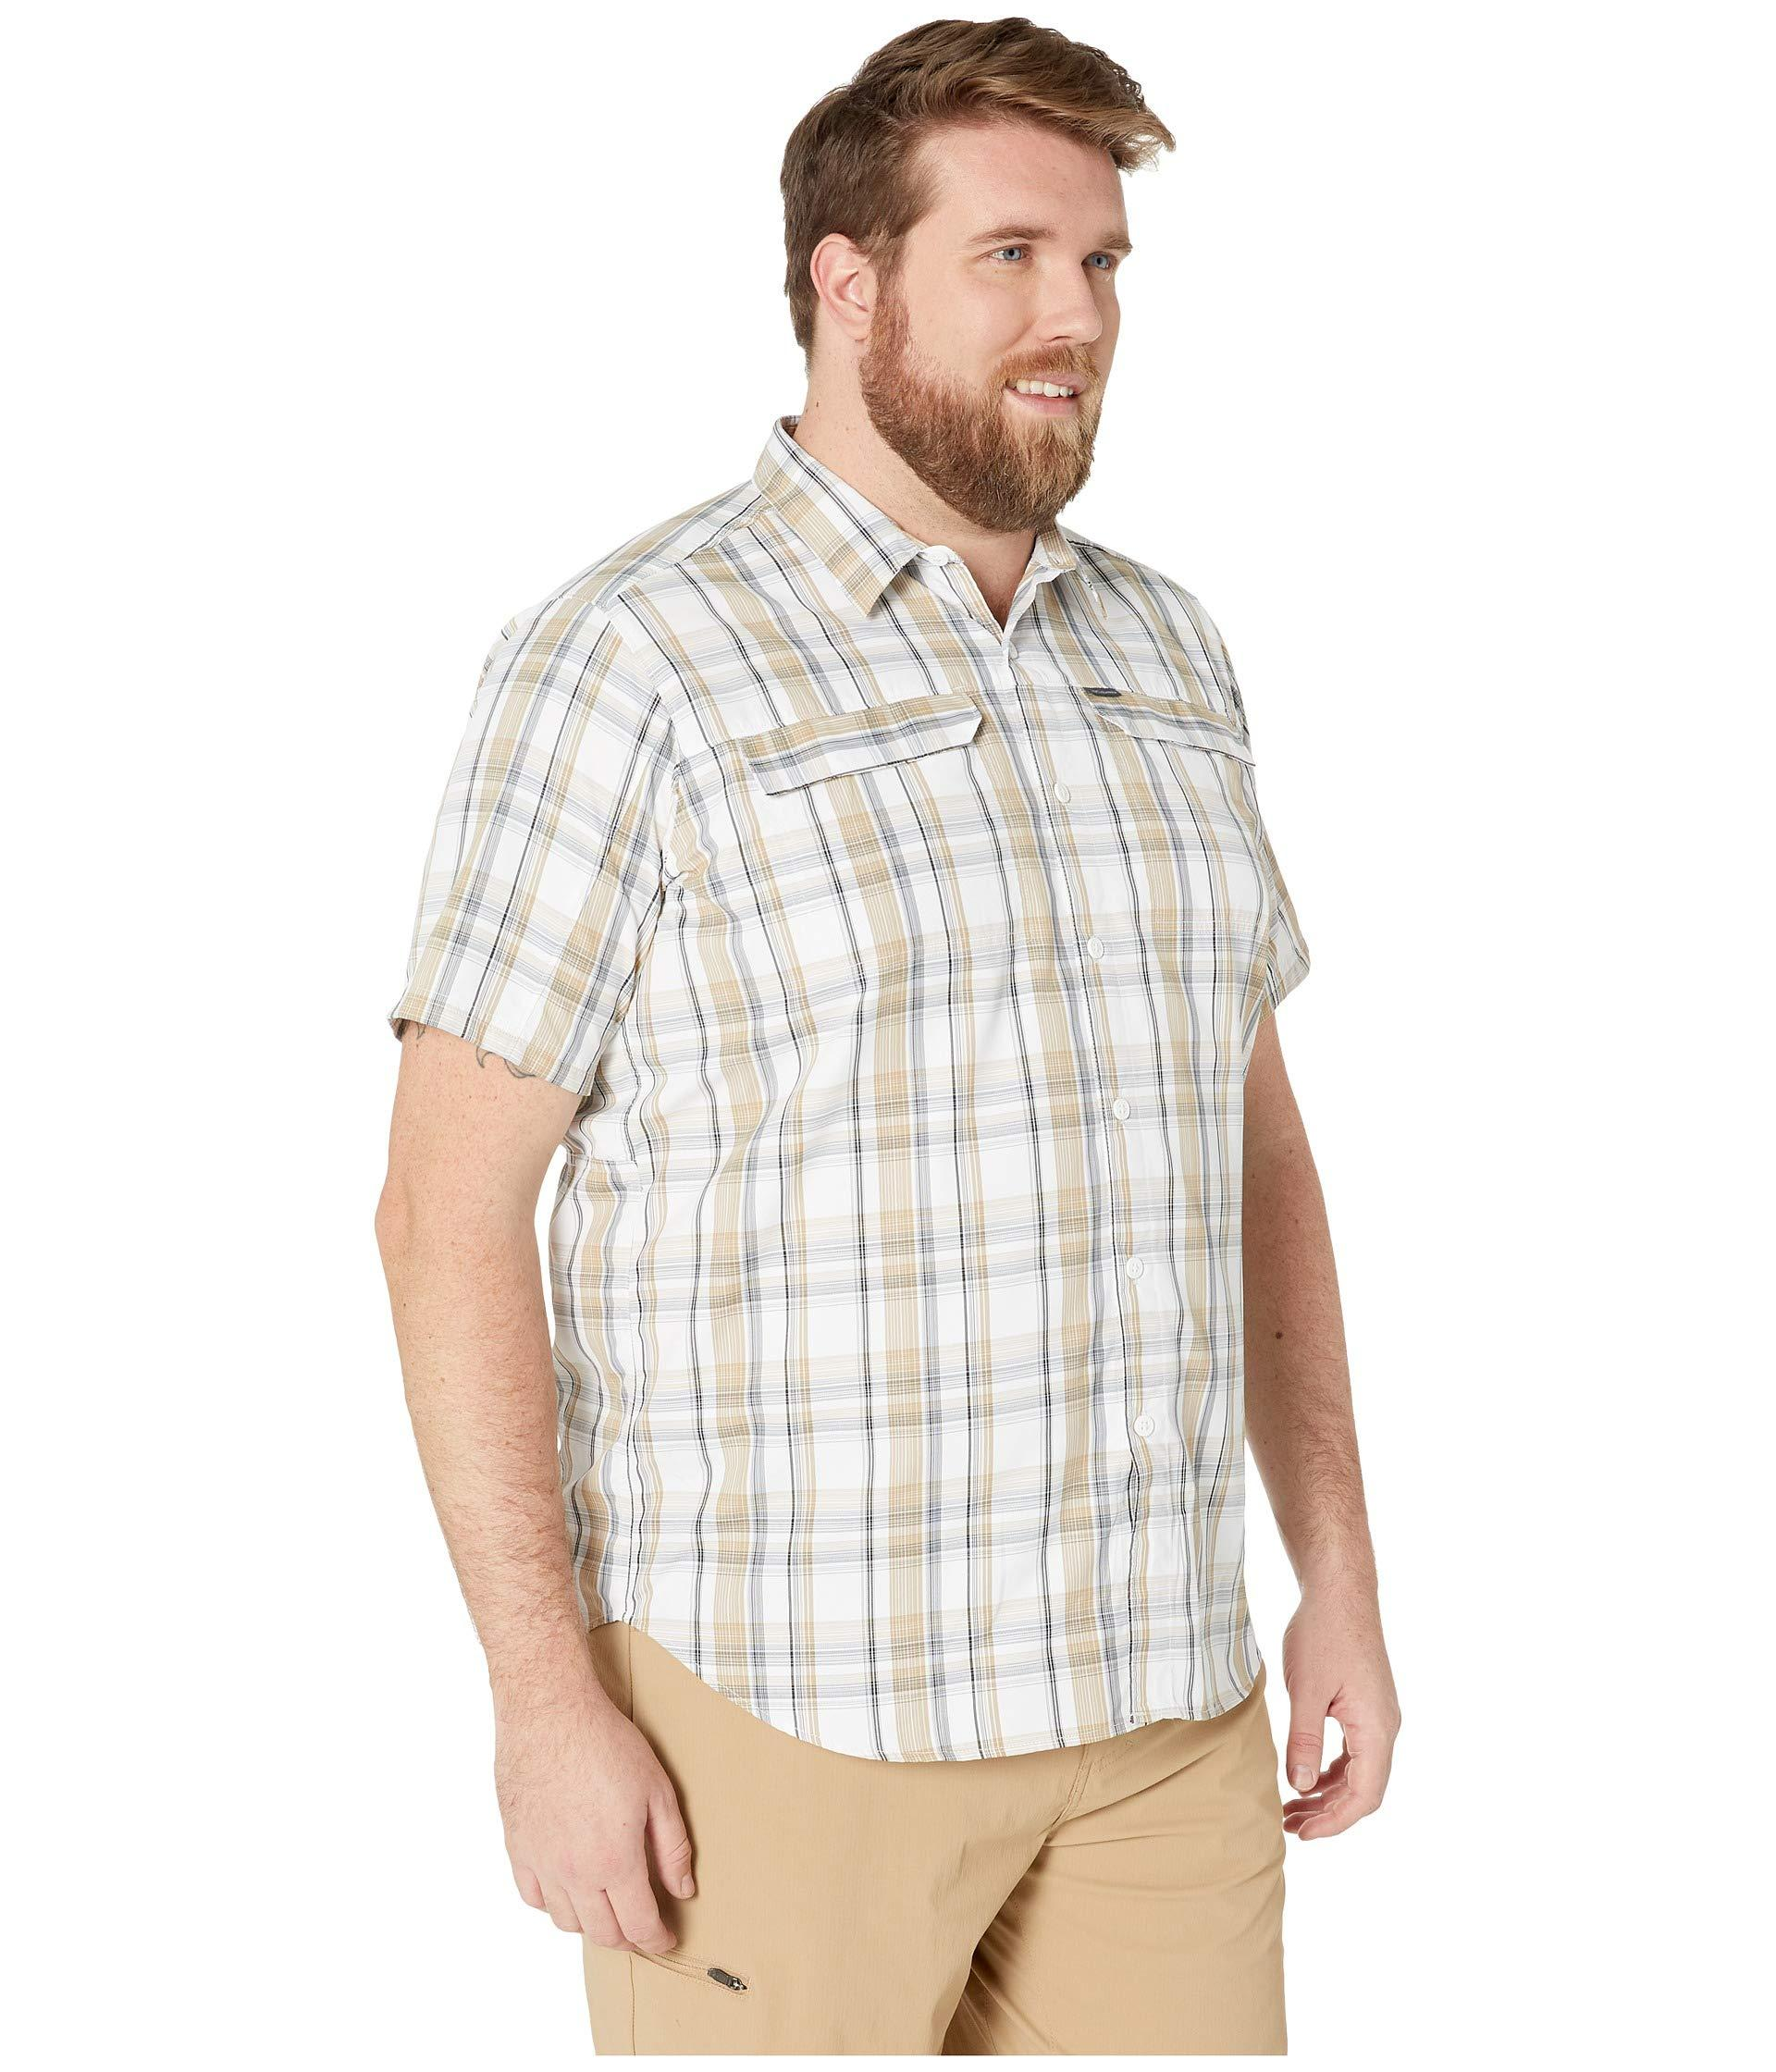 08937661adb Columbia - Multicolor Big And Tall Silver Ridge 2.0 Multi Plaid Short  Sleeve Shirt (beach. View fullscreen